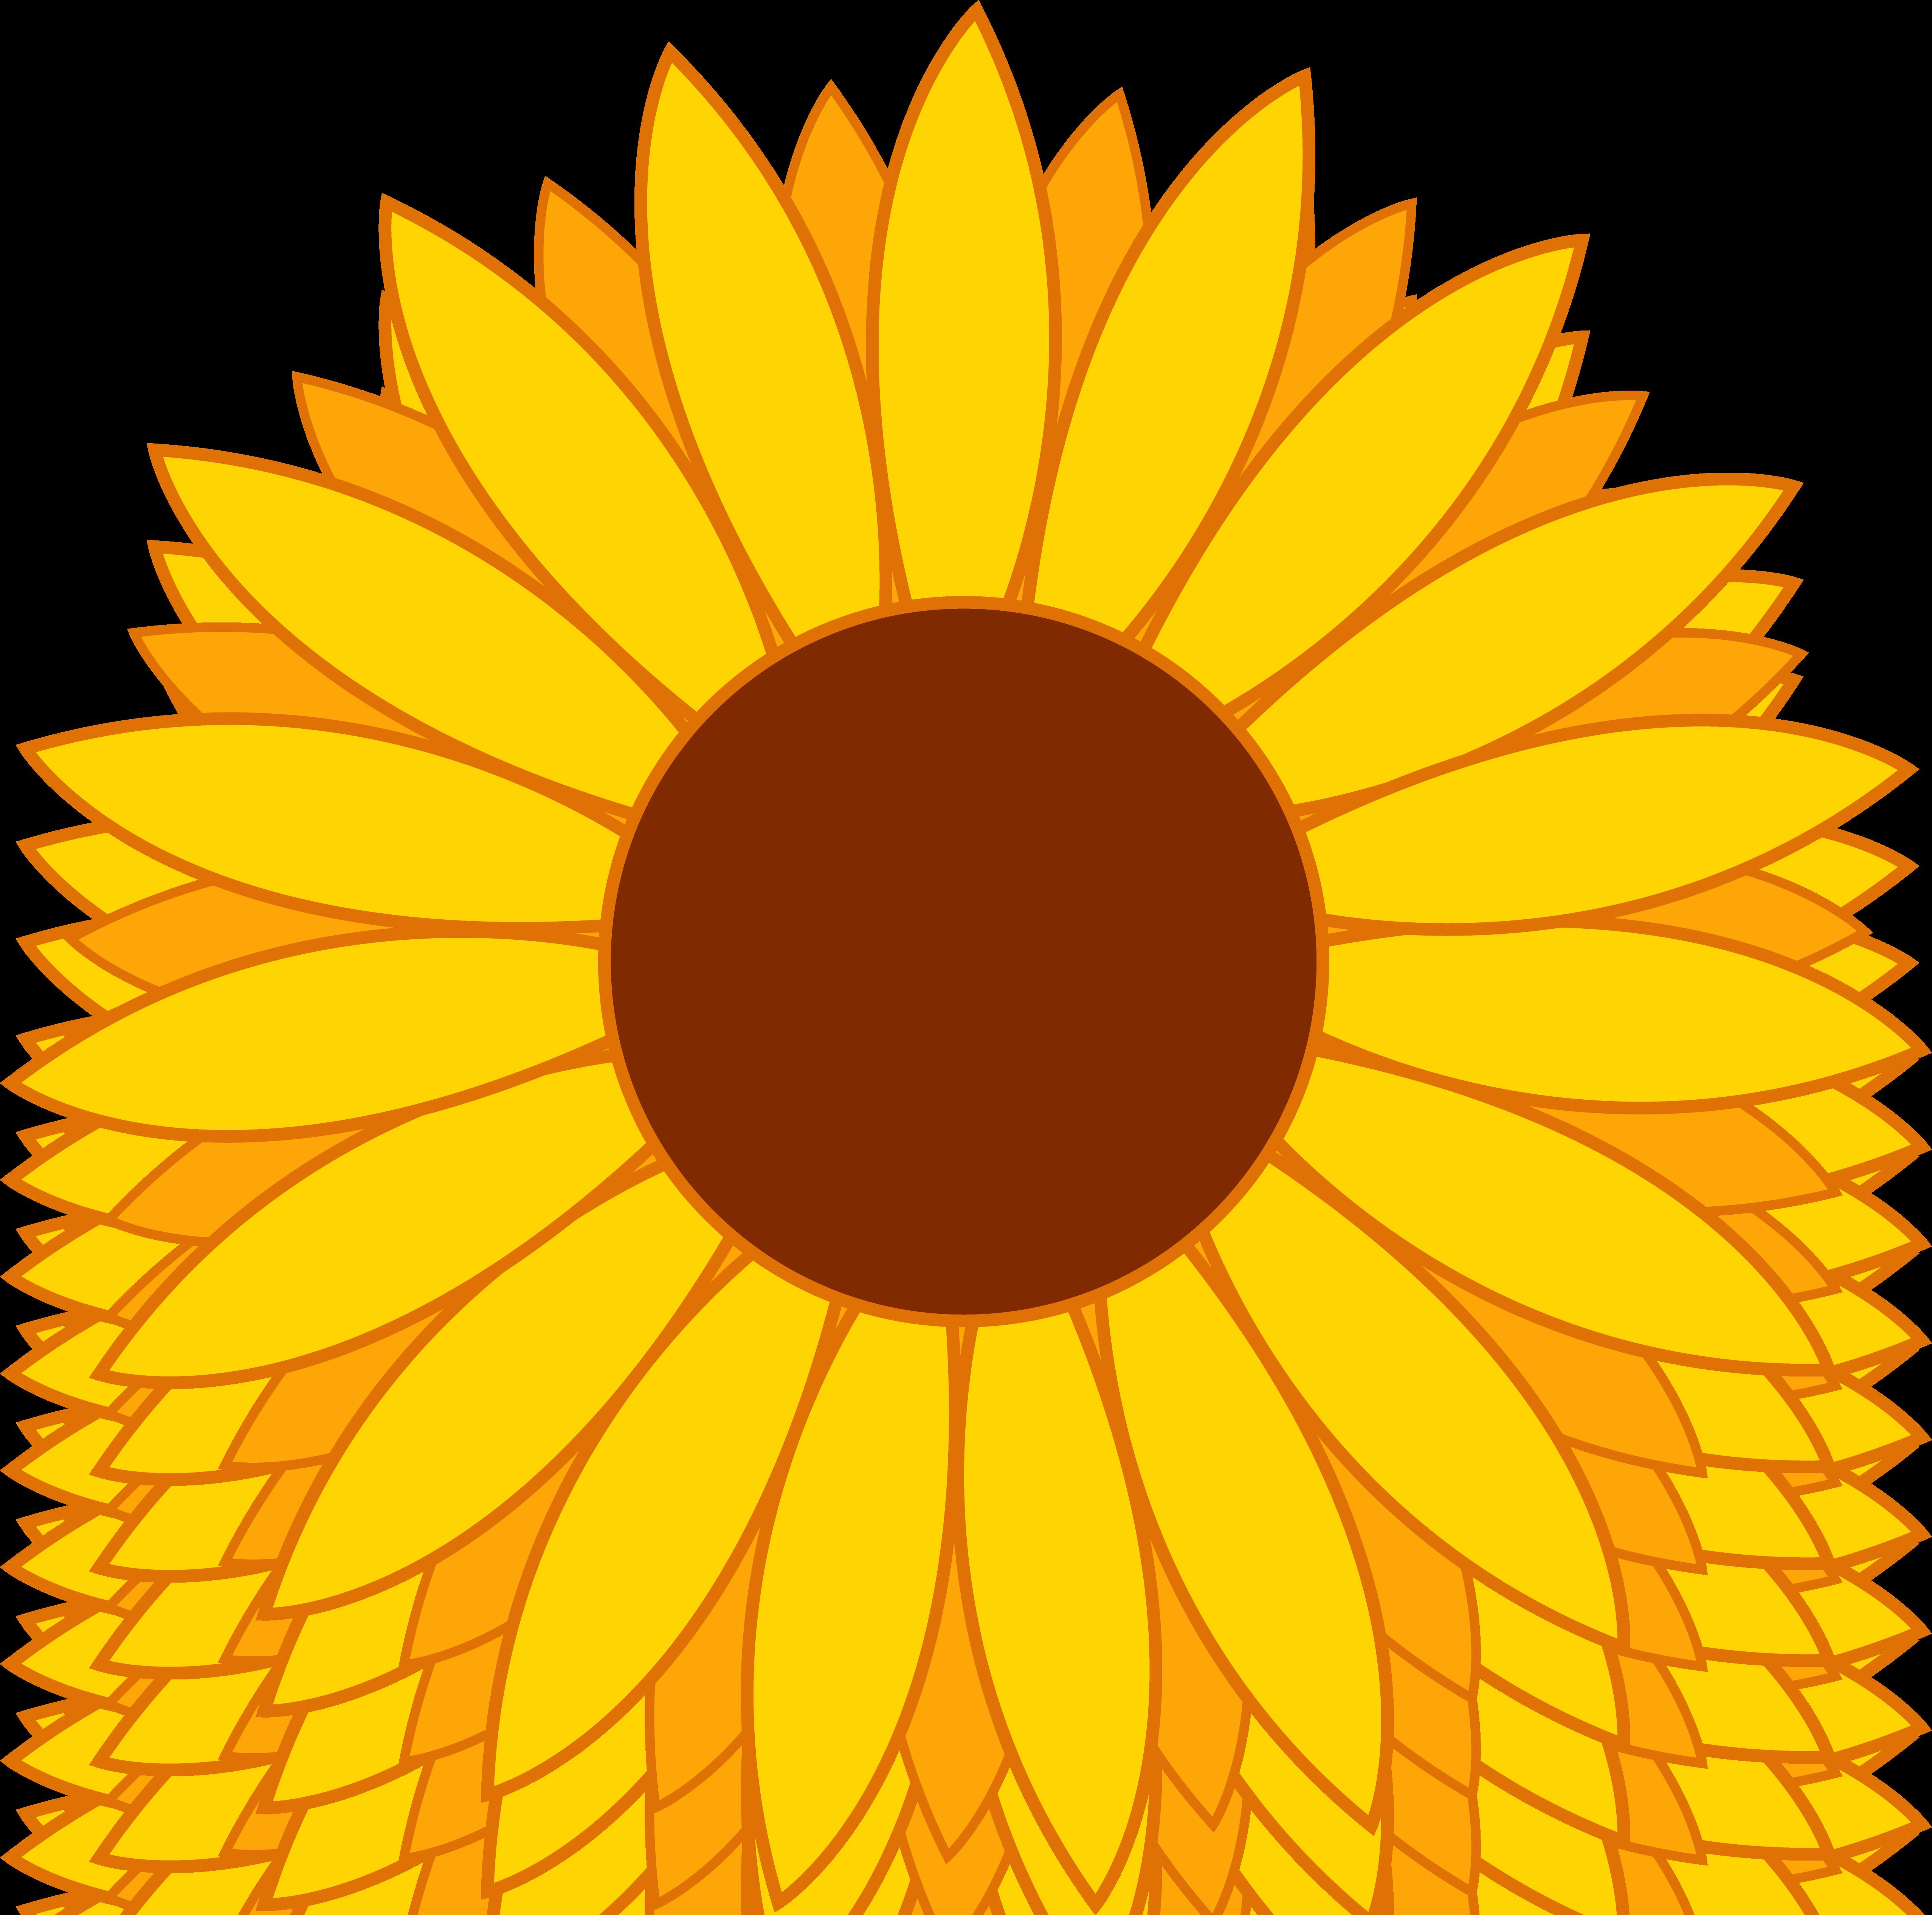 5110x5064 Sunflower Clip Art Free Printable Clipart 4